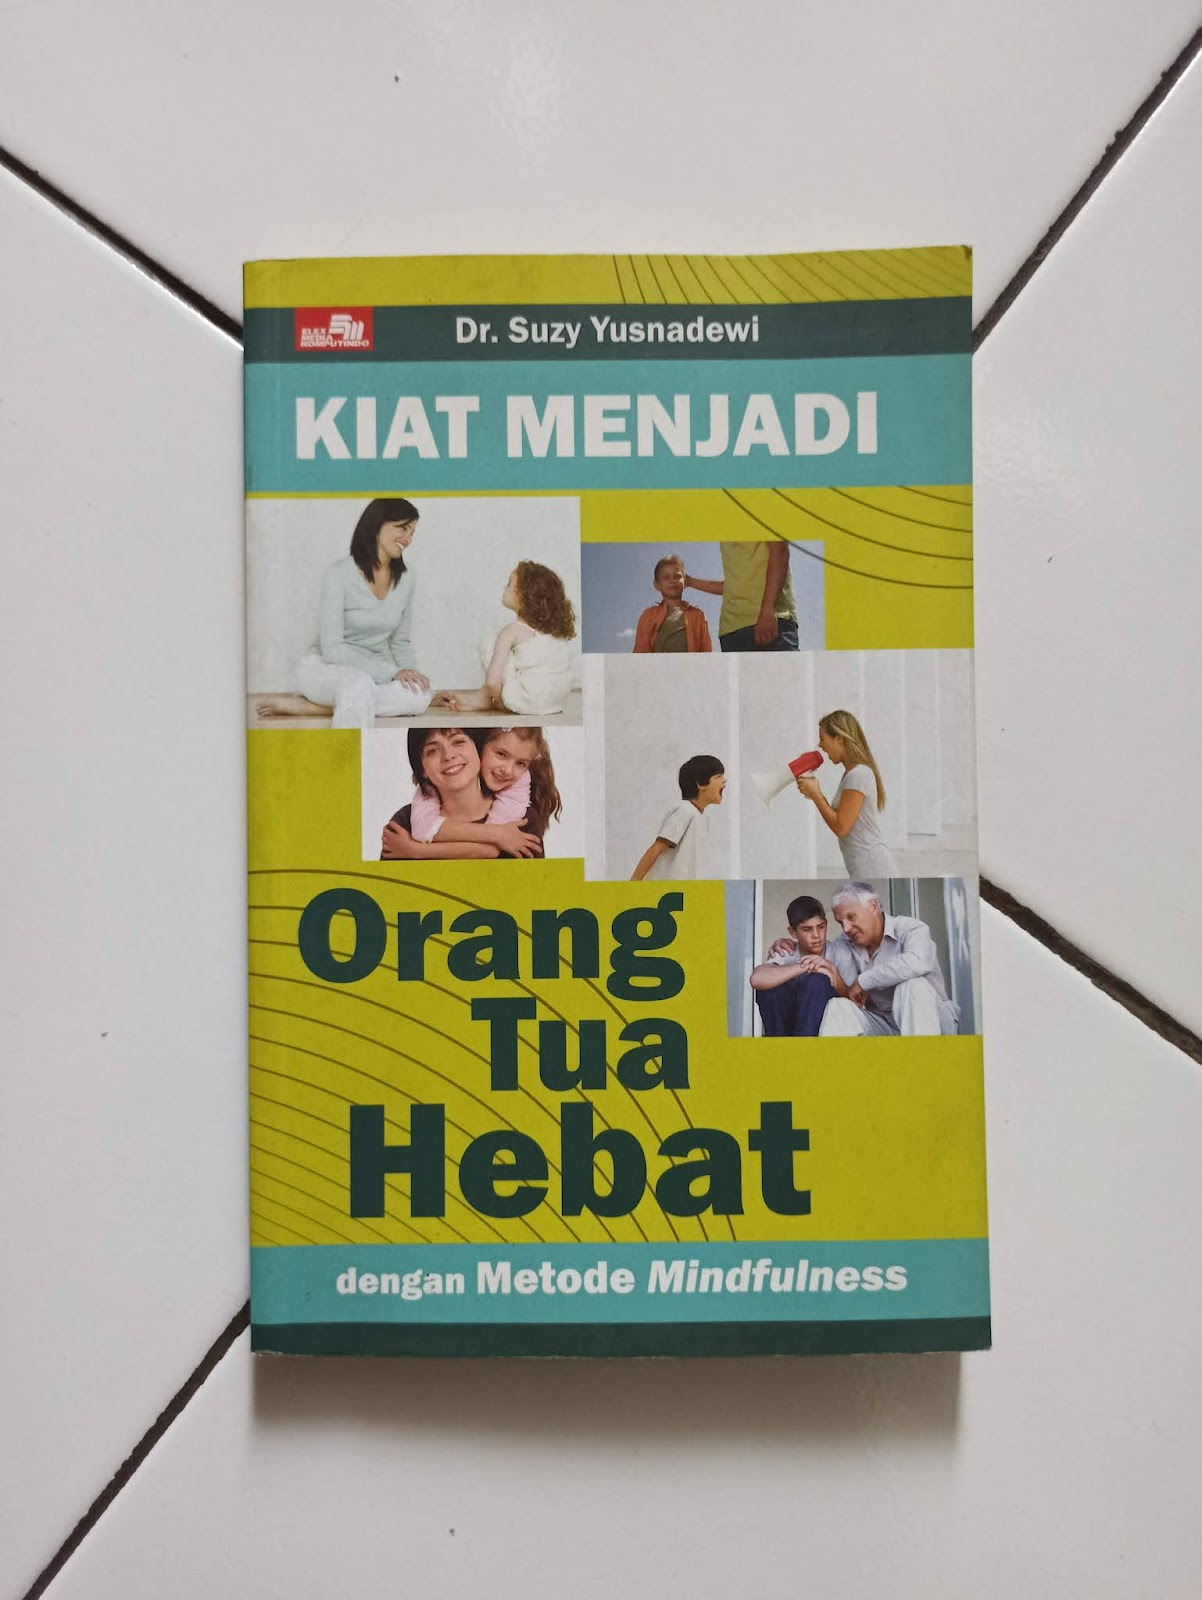 Buku Parenting karya Dr Suzy Yusnadewi